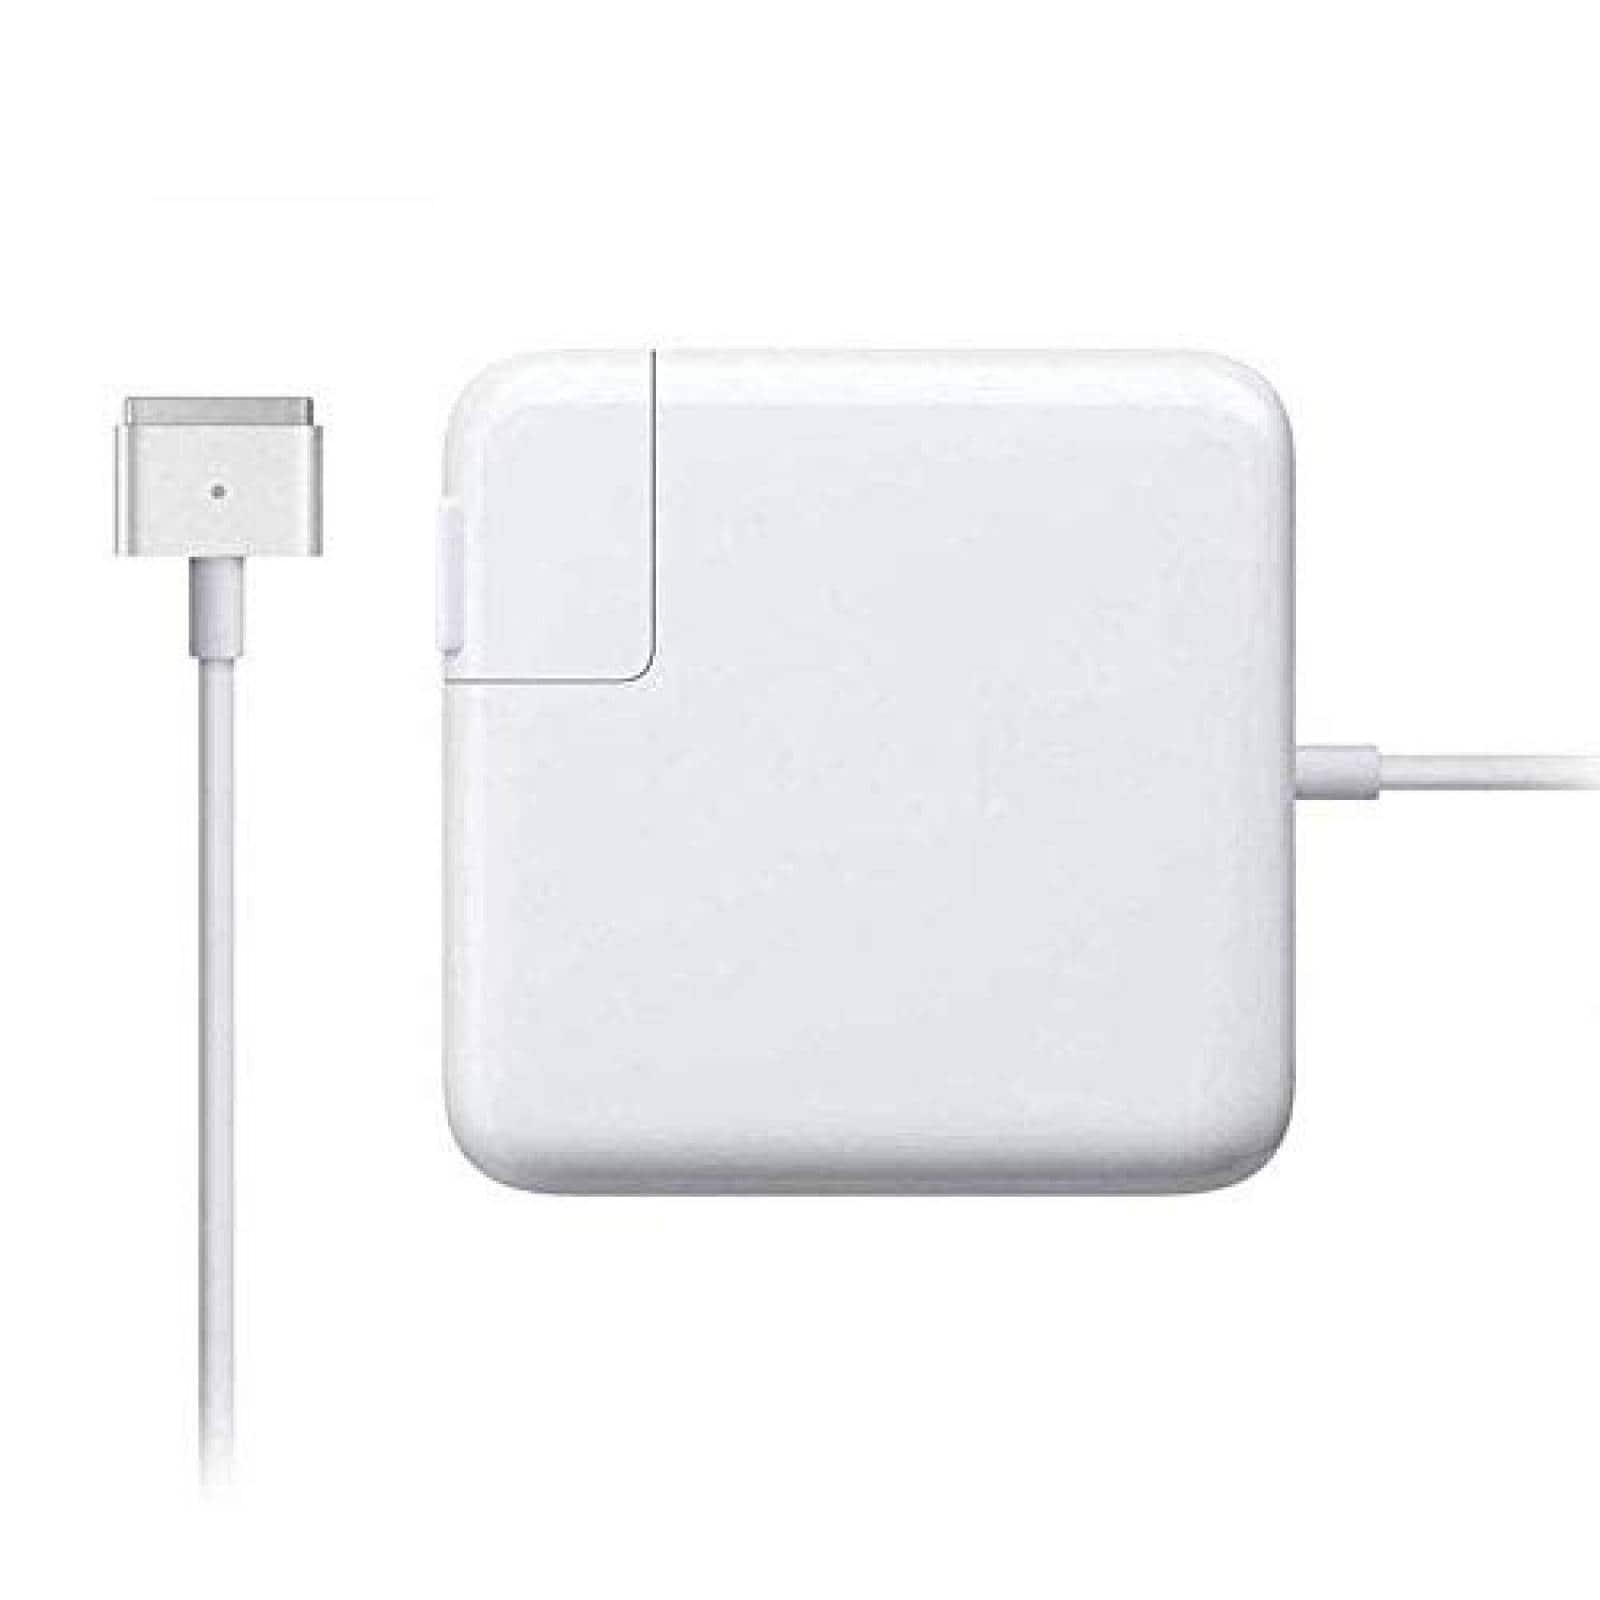 Cargador DDSUN MacBook Air despues de 2012 45W punta T